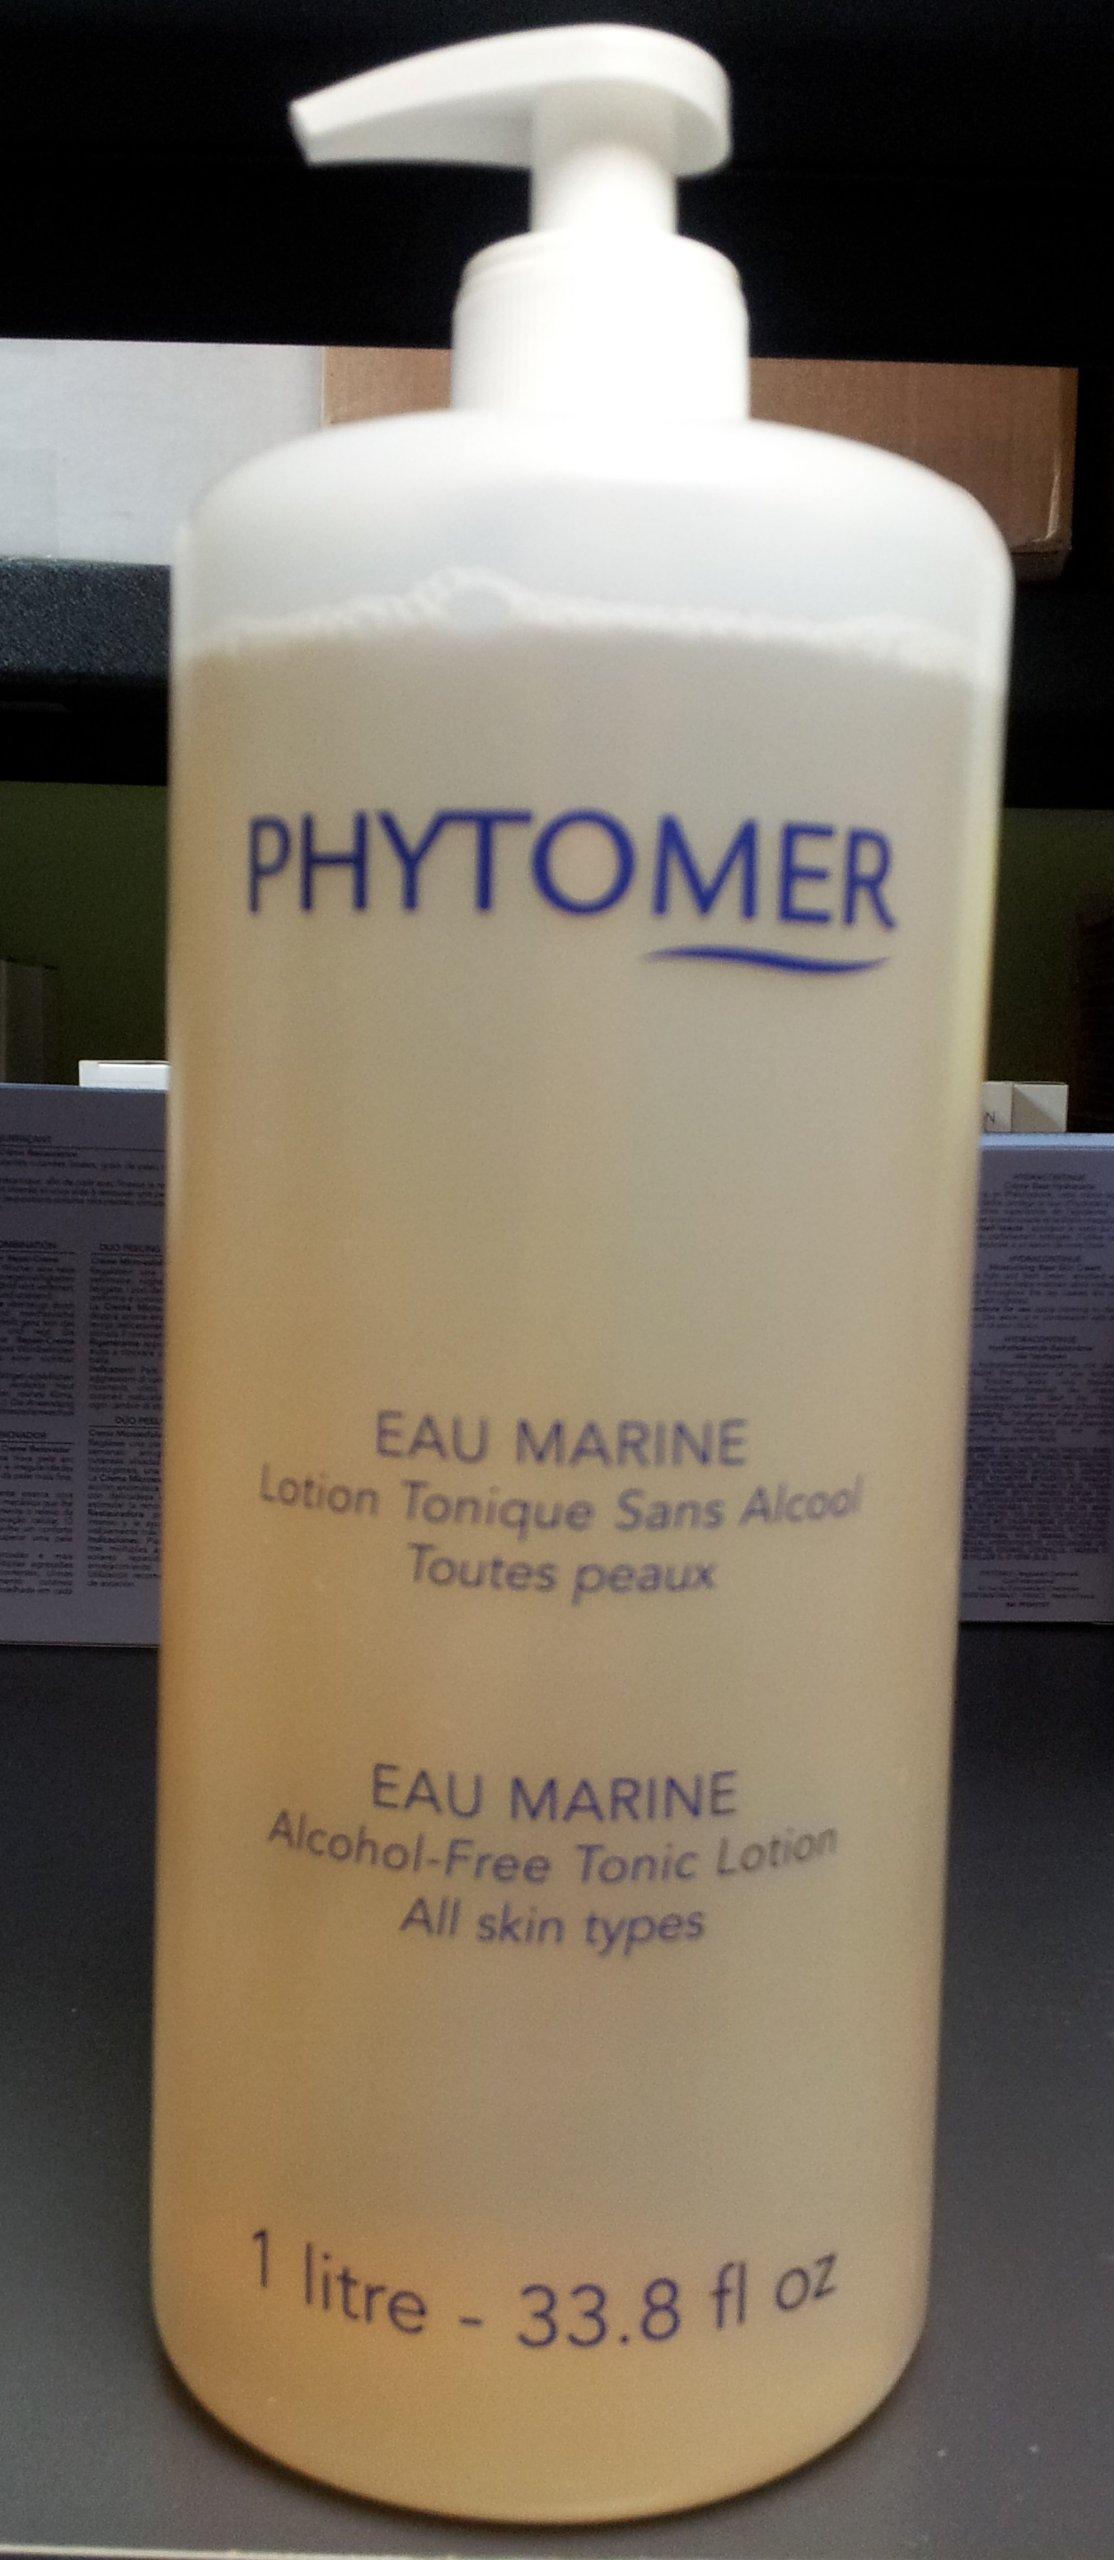 PHYTOMER Eau Marine Alcohol-Free Tonic Lotion Professional size 1 liter 33.8 fl oz (Huge, BIGGER Size)